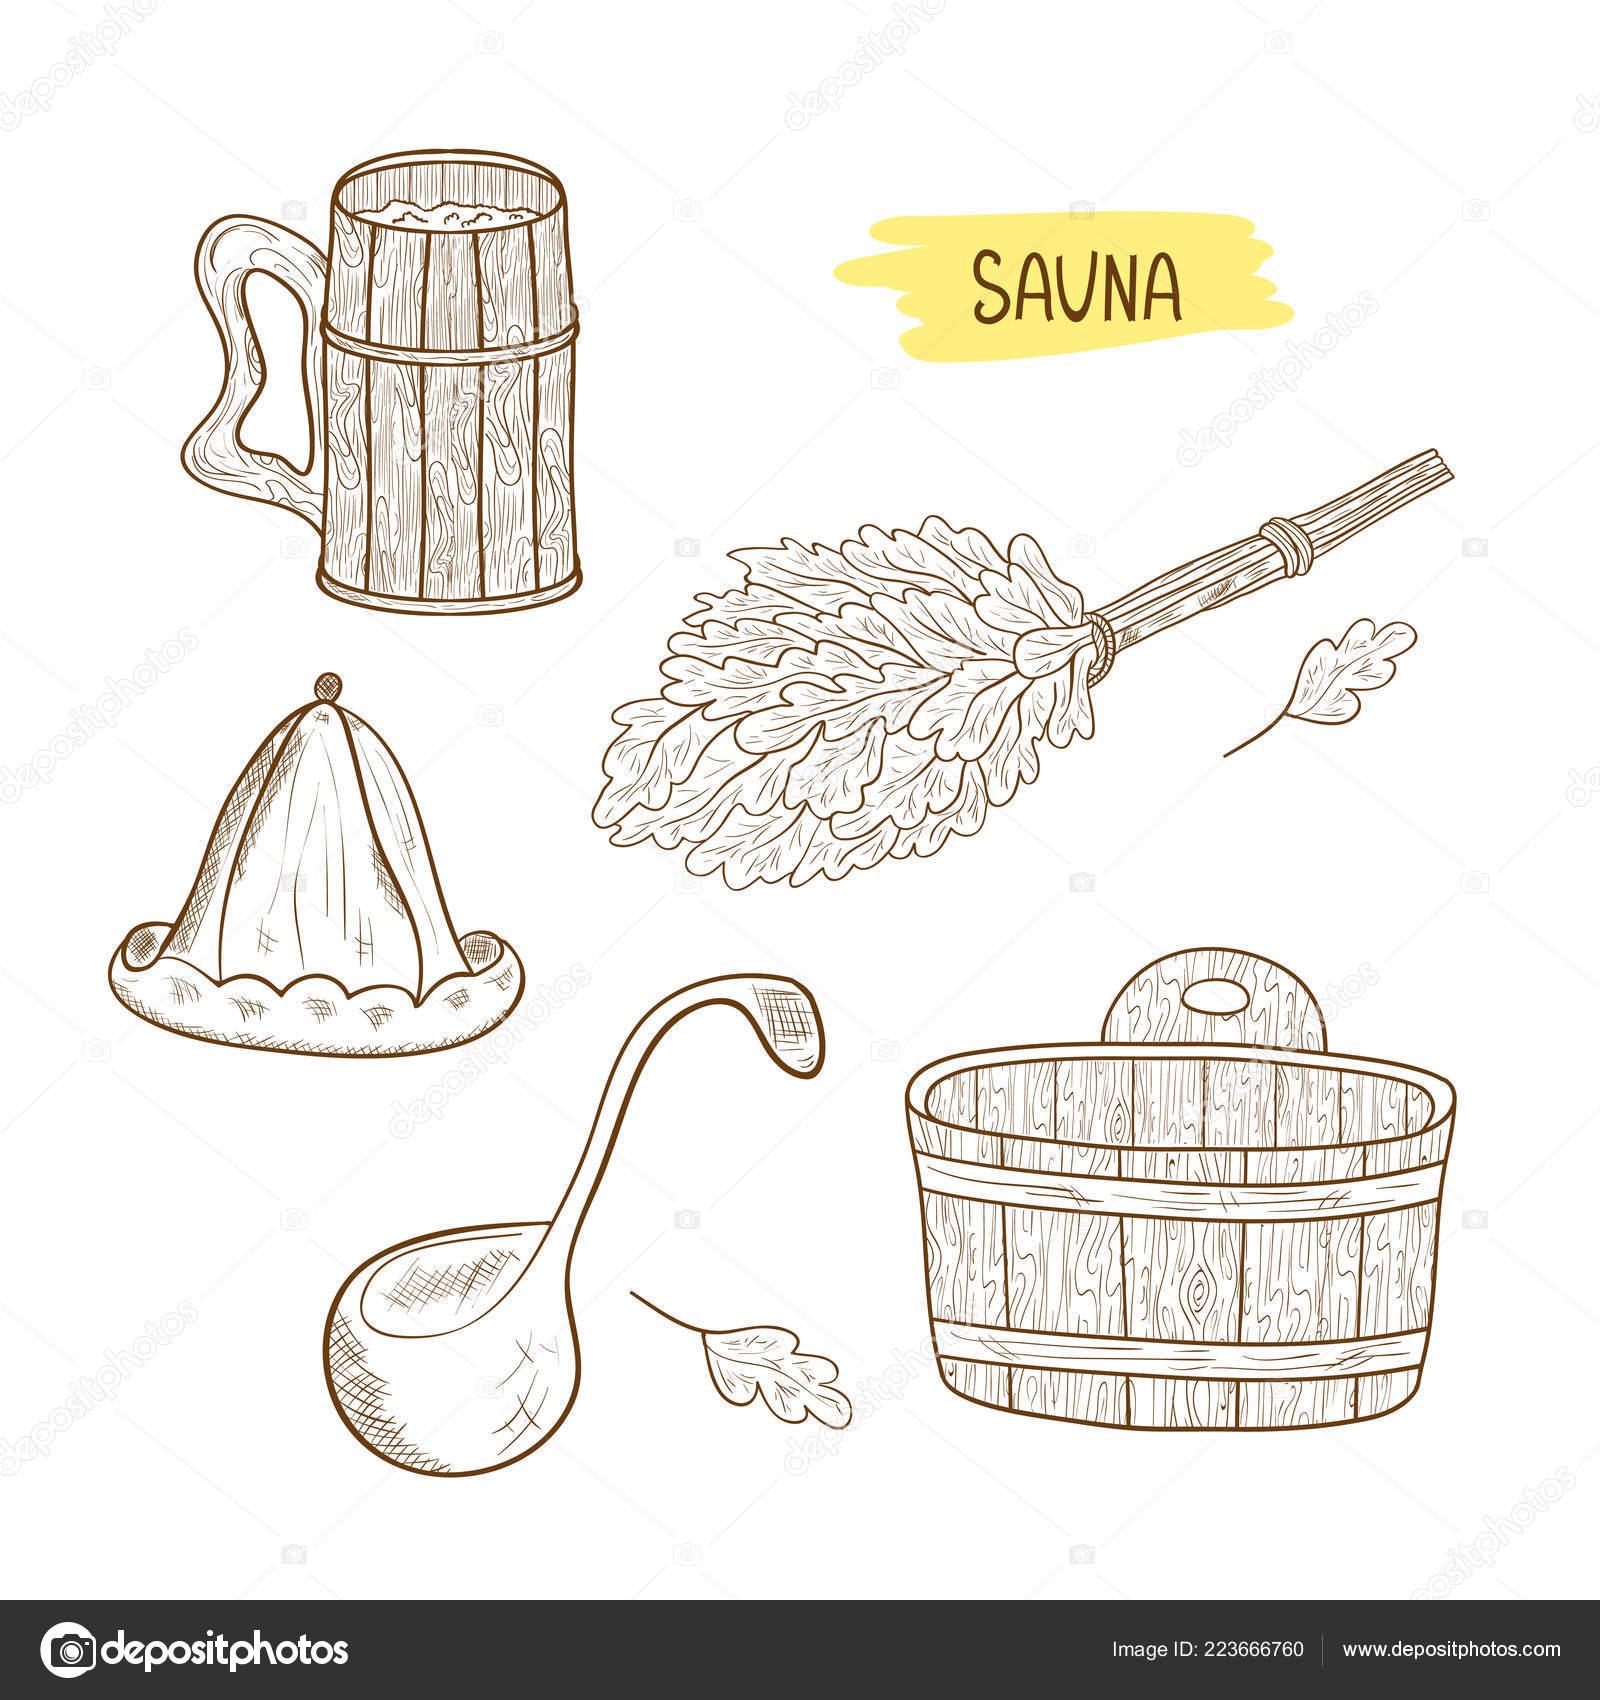 Веник рисунок для бани карандашом